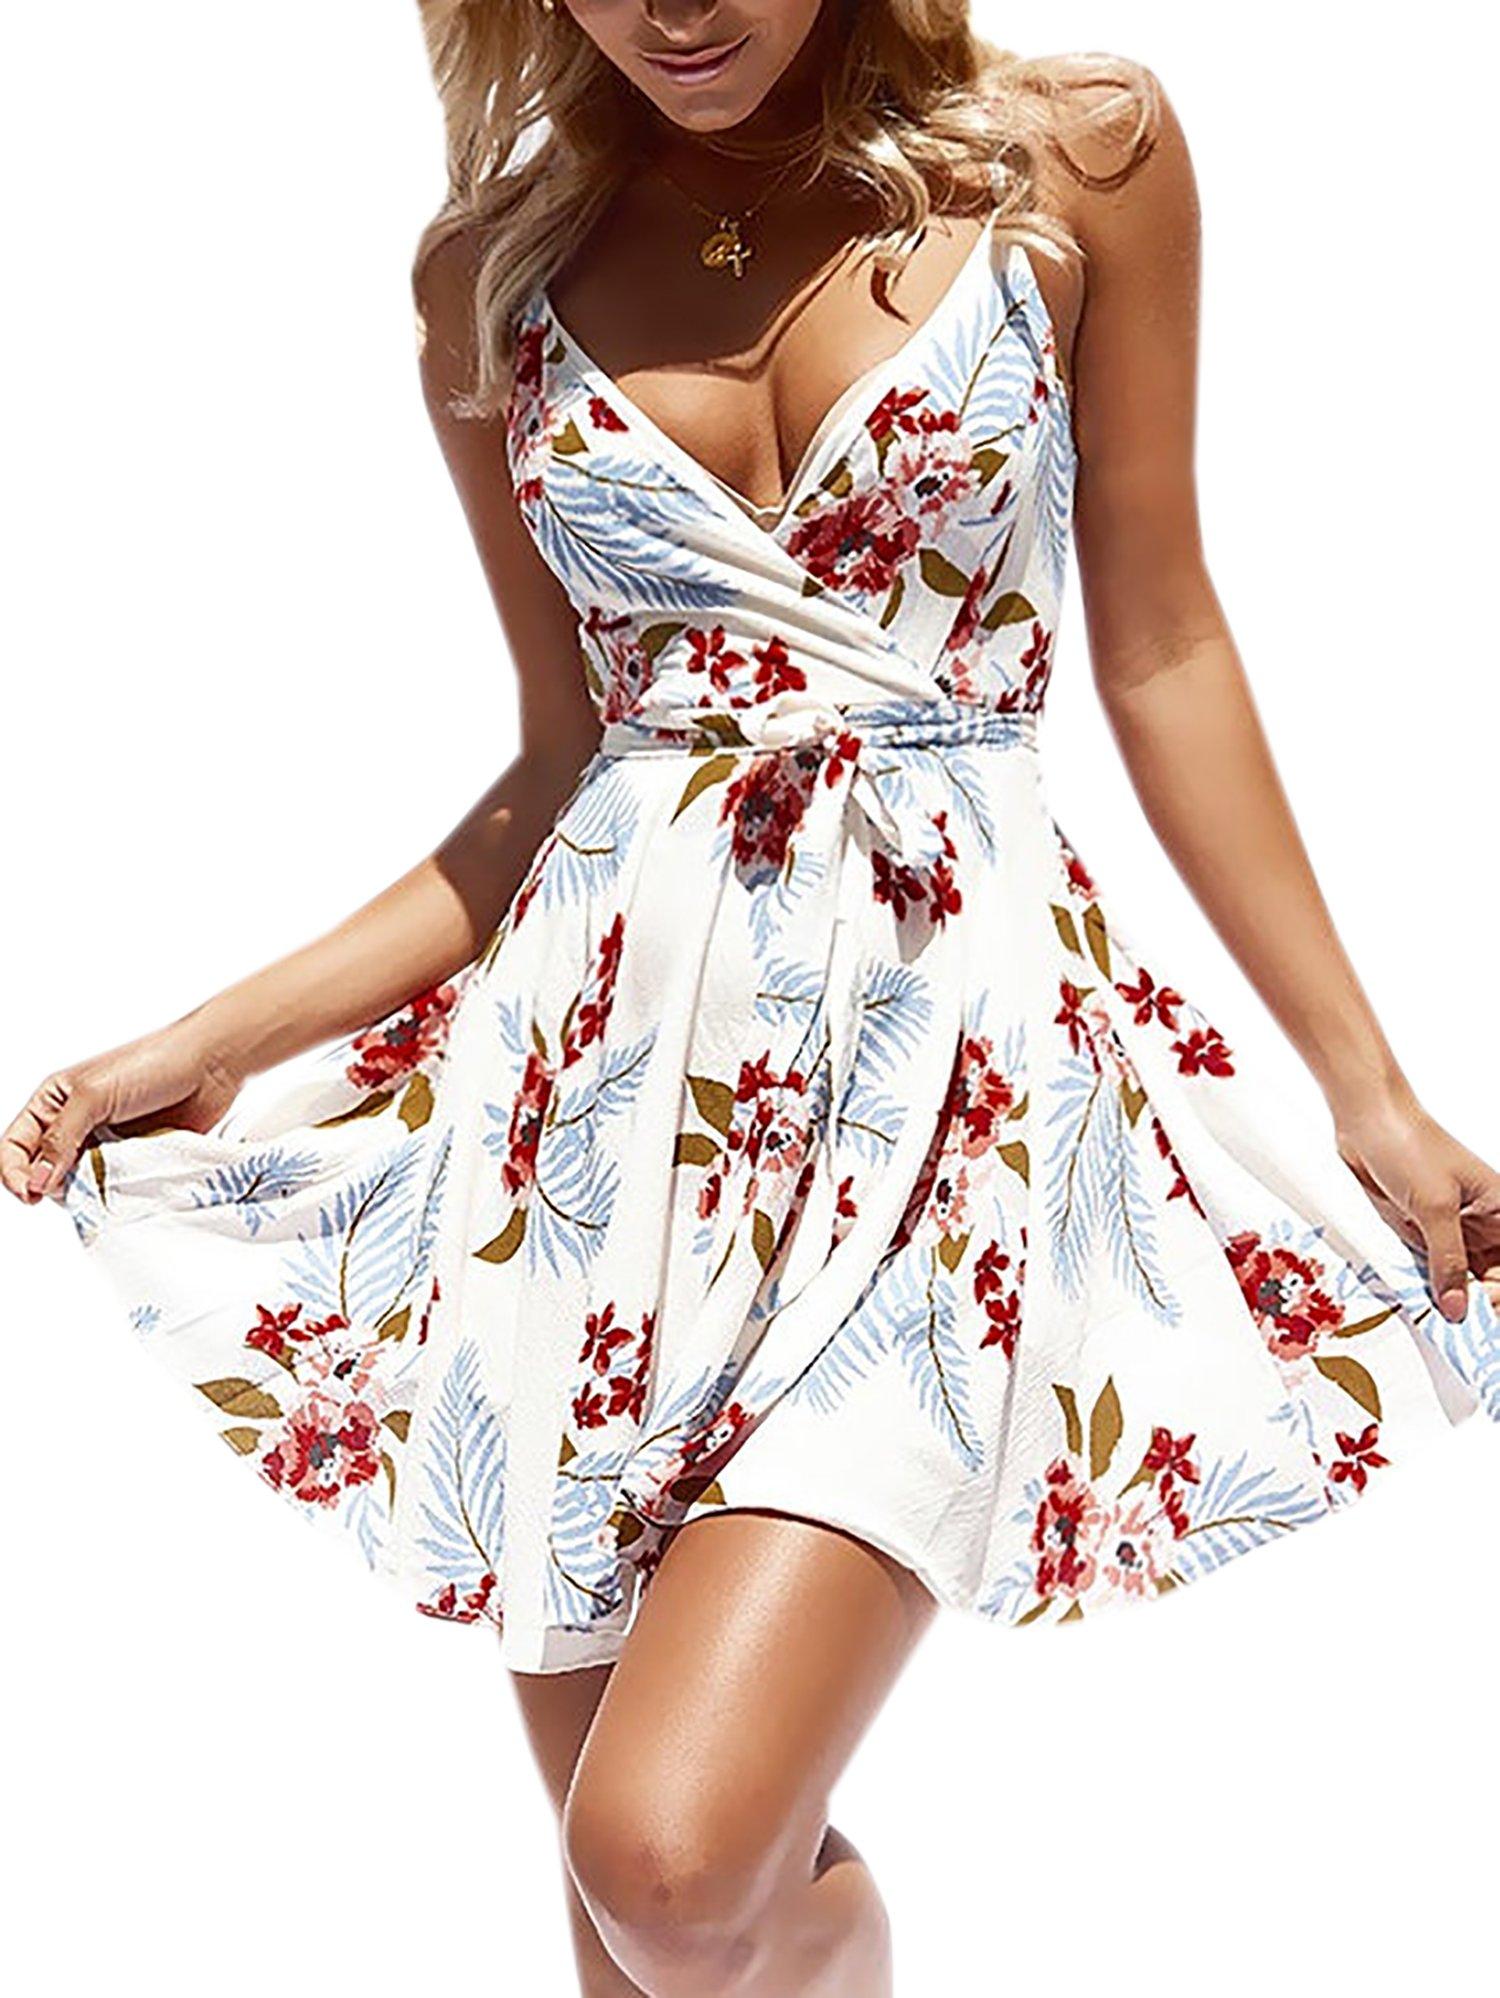 ECOWISH Womens Dresses Summer Floral Print V-Neck Spaghetti Strap Mini Swing Skater Dress with Belt White S